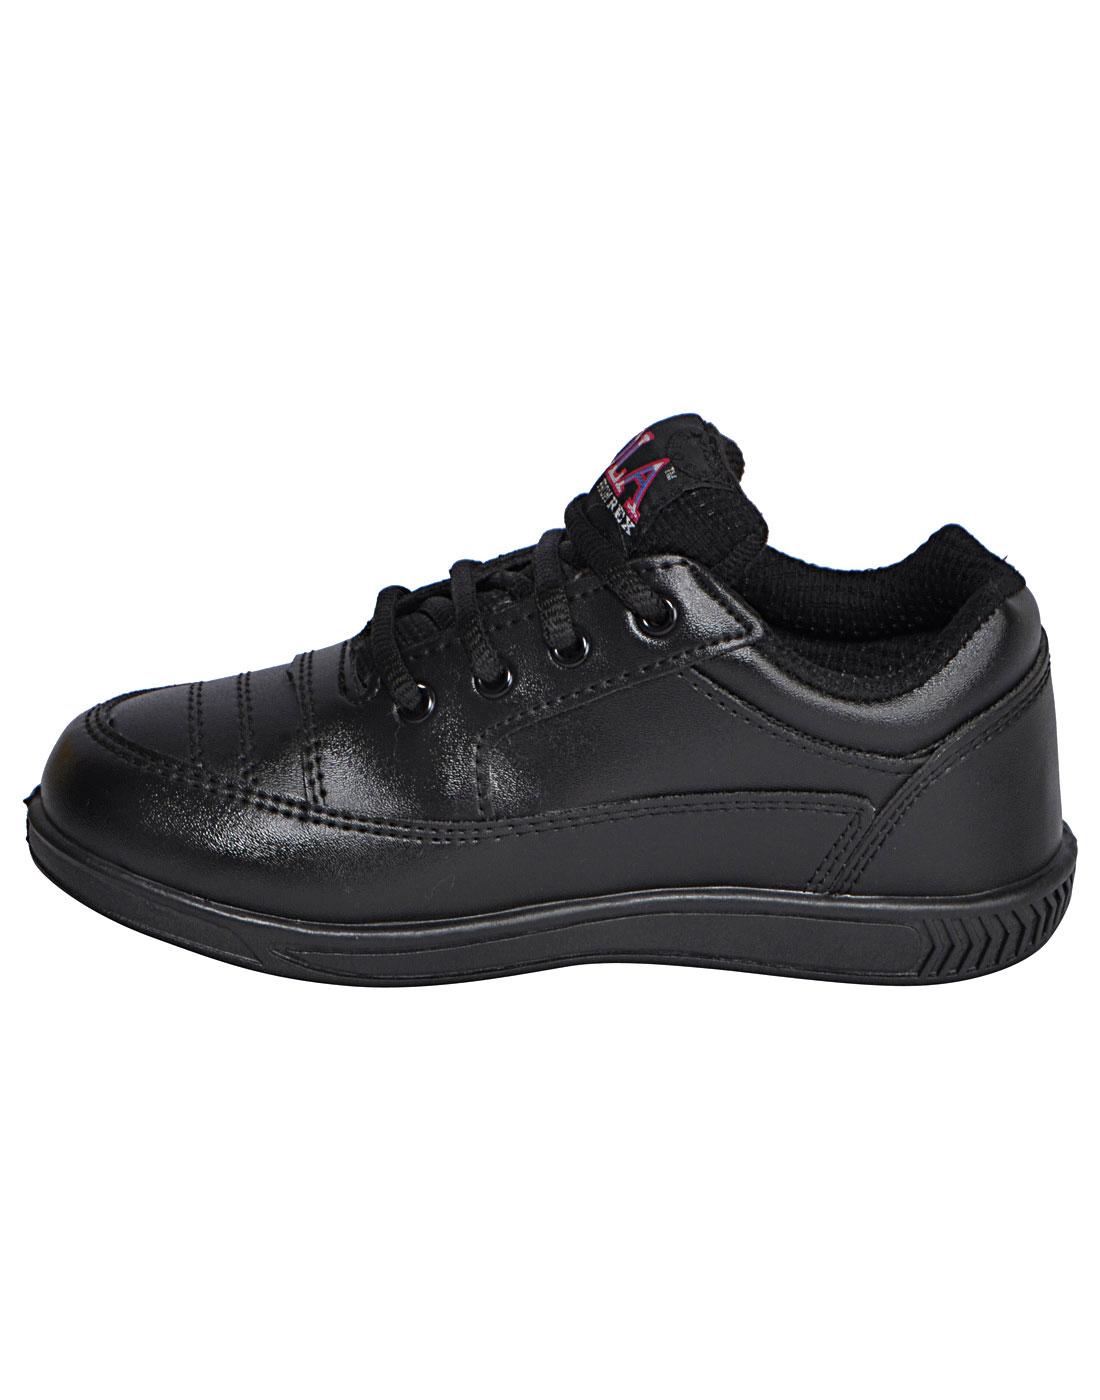 Rex Gola Shoes White